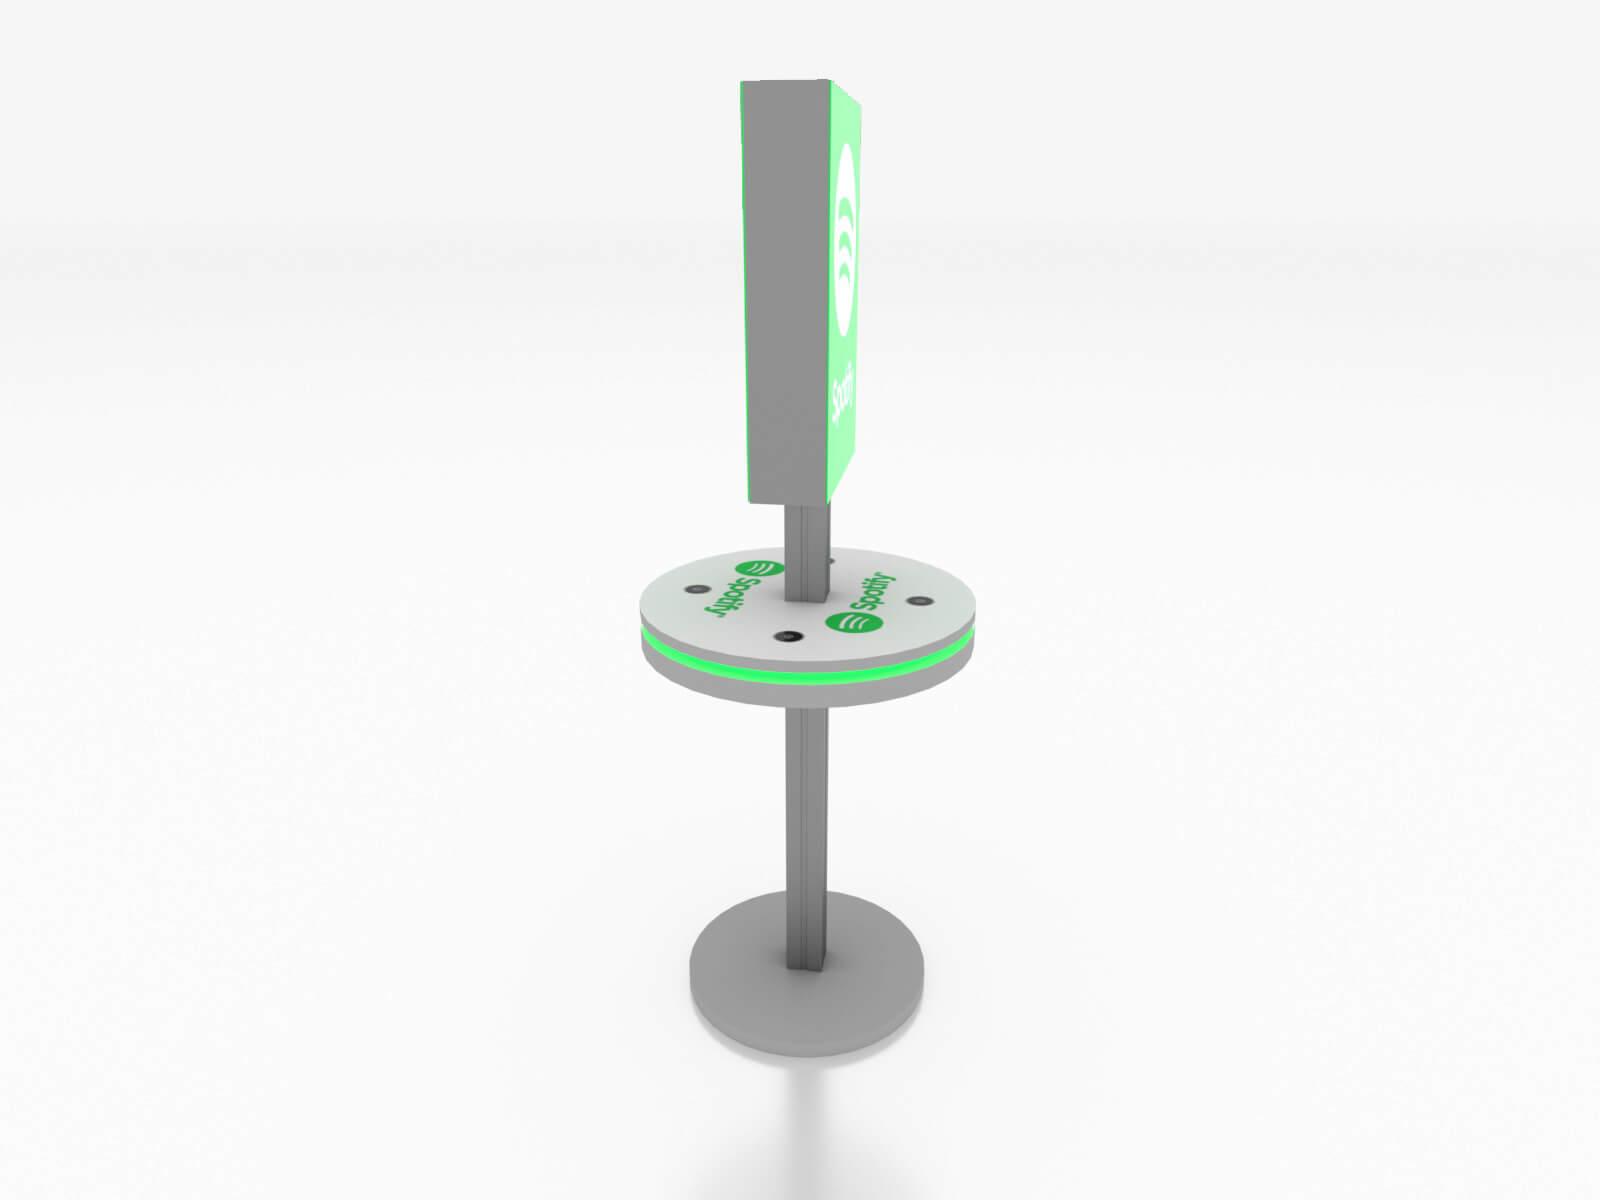 MOD-1475 Trade Show Lightbox Charging Station - image 3